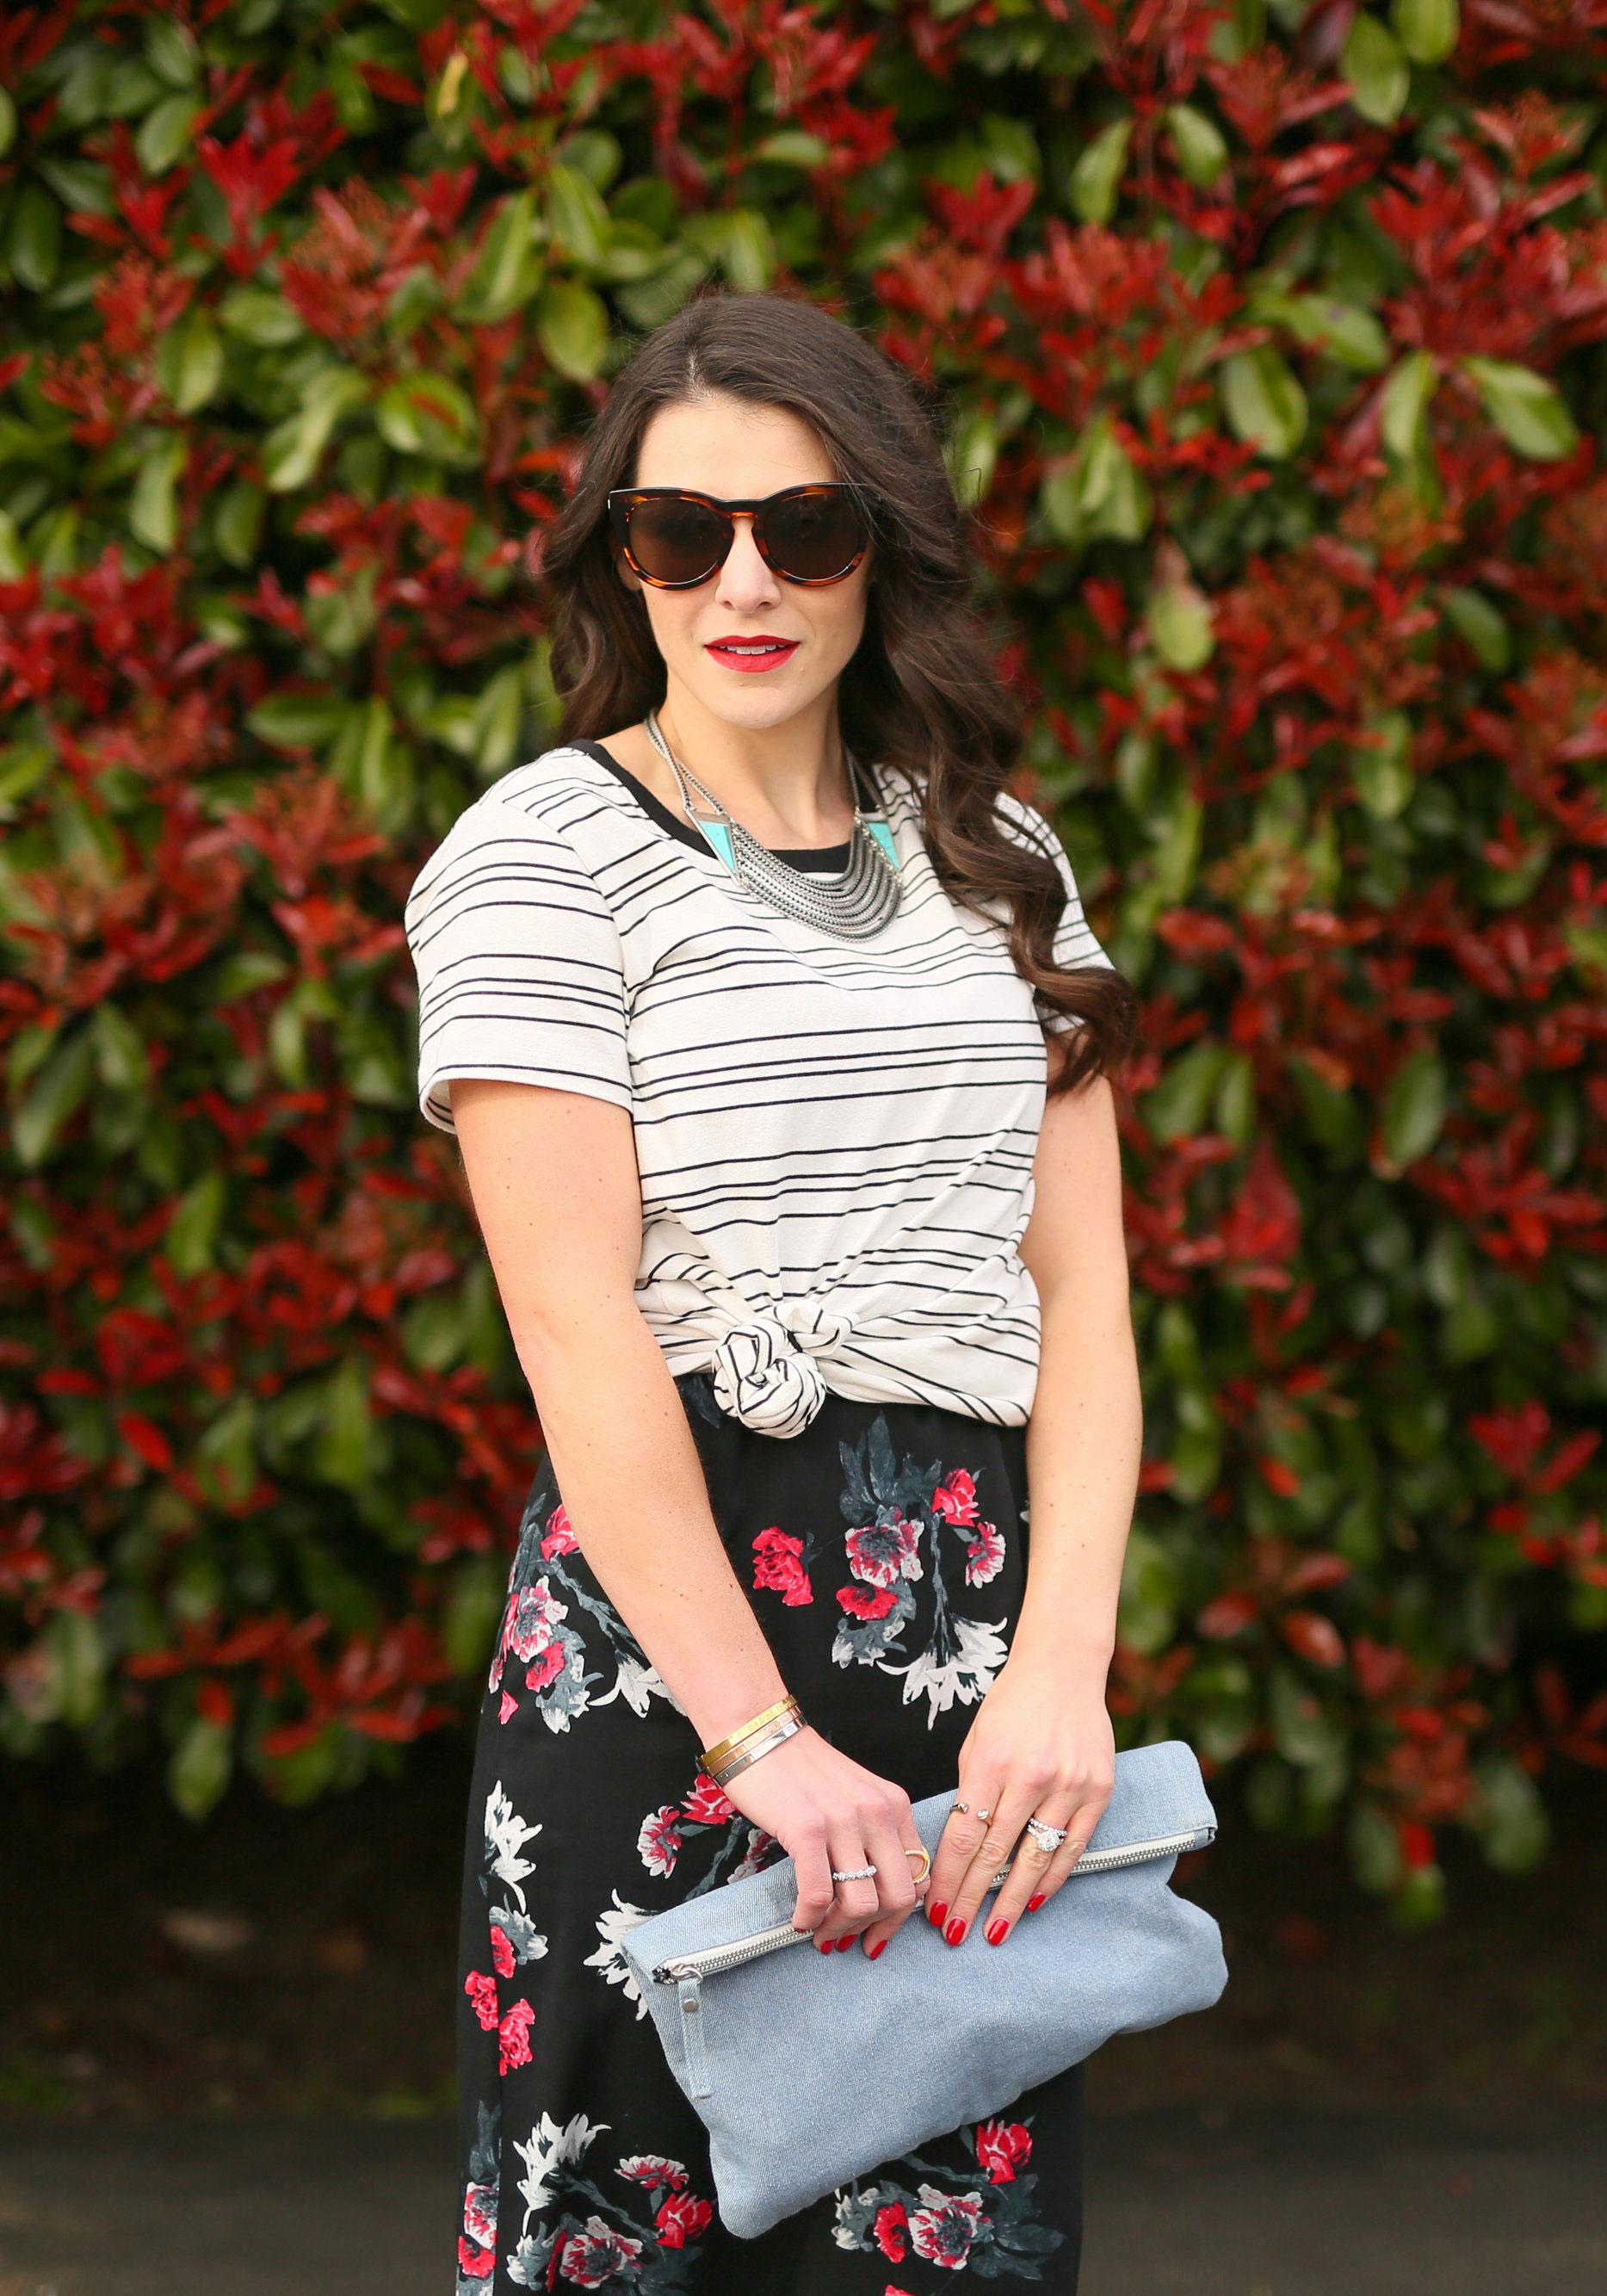 BB Dakota Miriam Floral Midi Dress, T-shirt tied in knot over dress, Mixing Stripes and Floral Prints, Lespecs Jealous Games Sunglasses